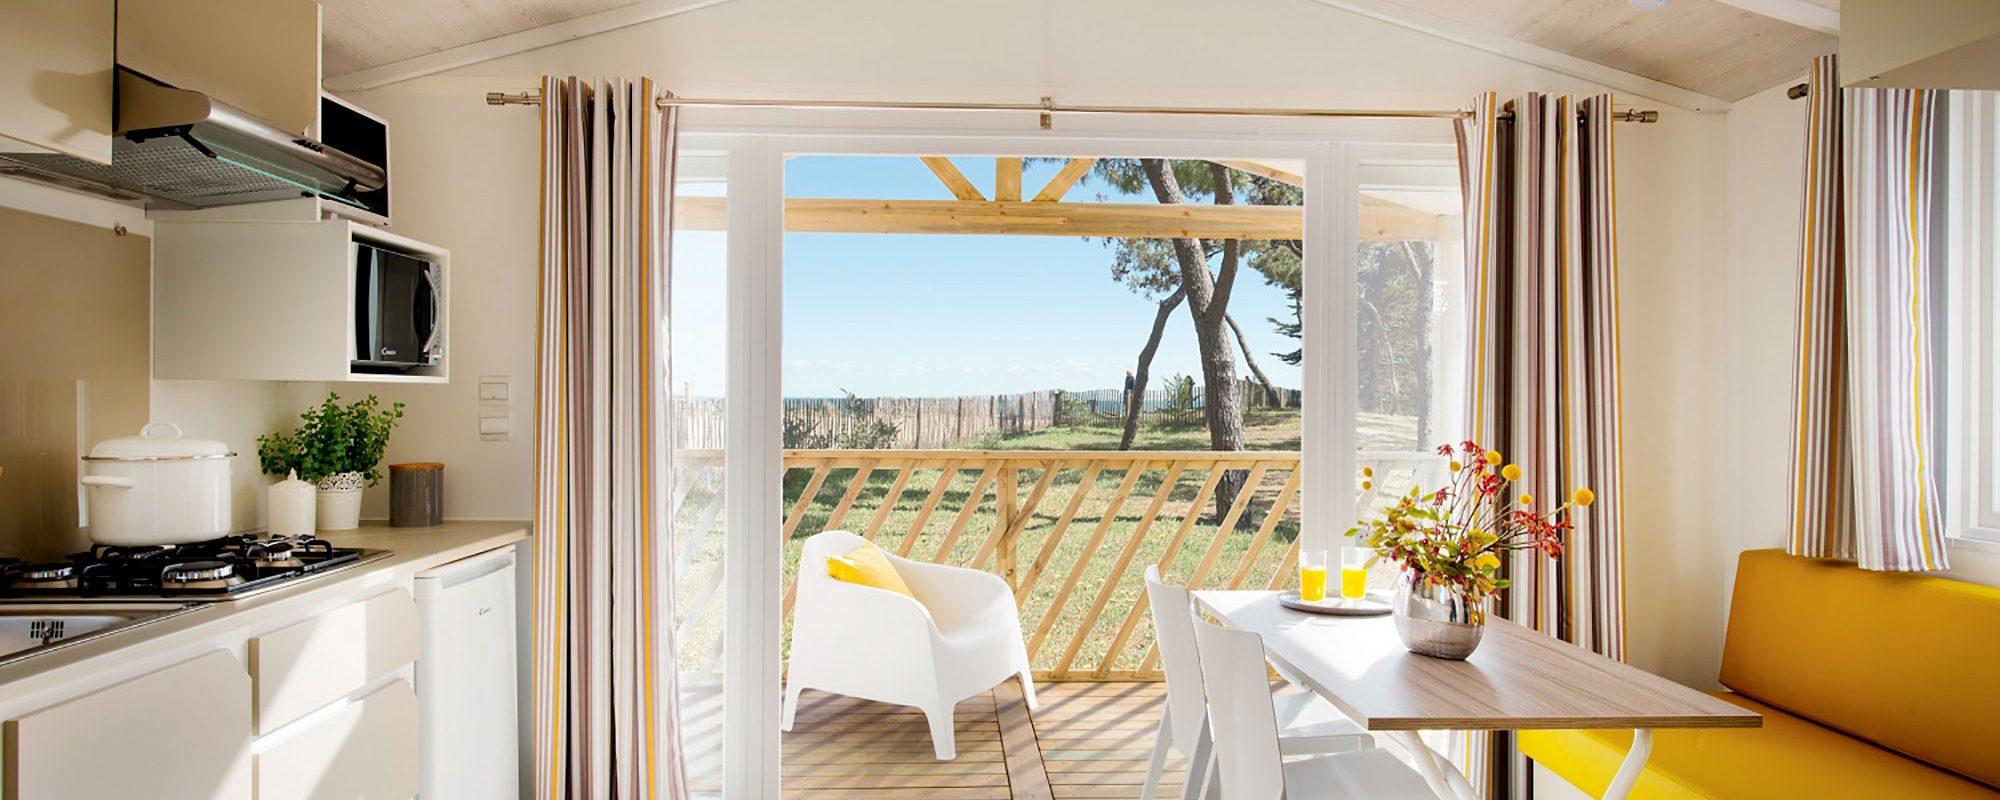 Location de mobilhome loggia bay au camping en Loire Atlantique : terrasse